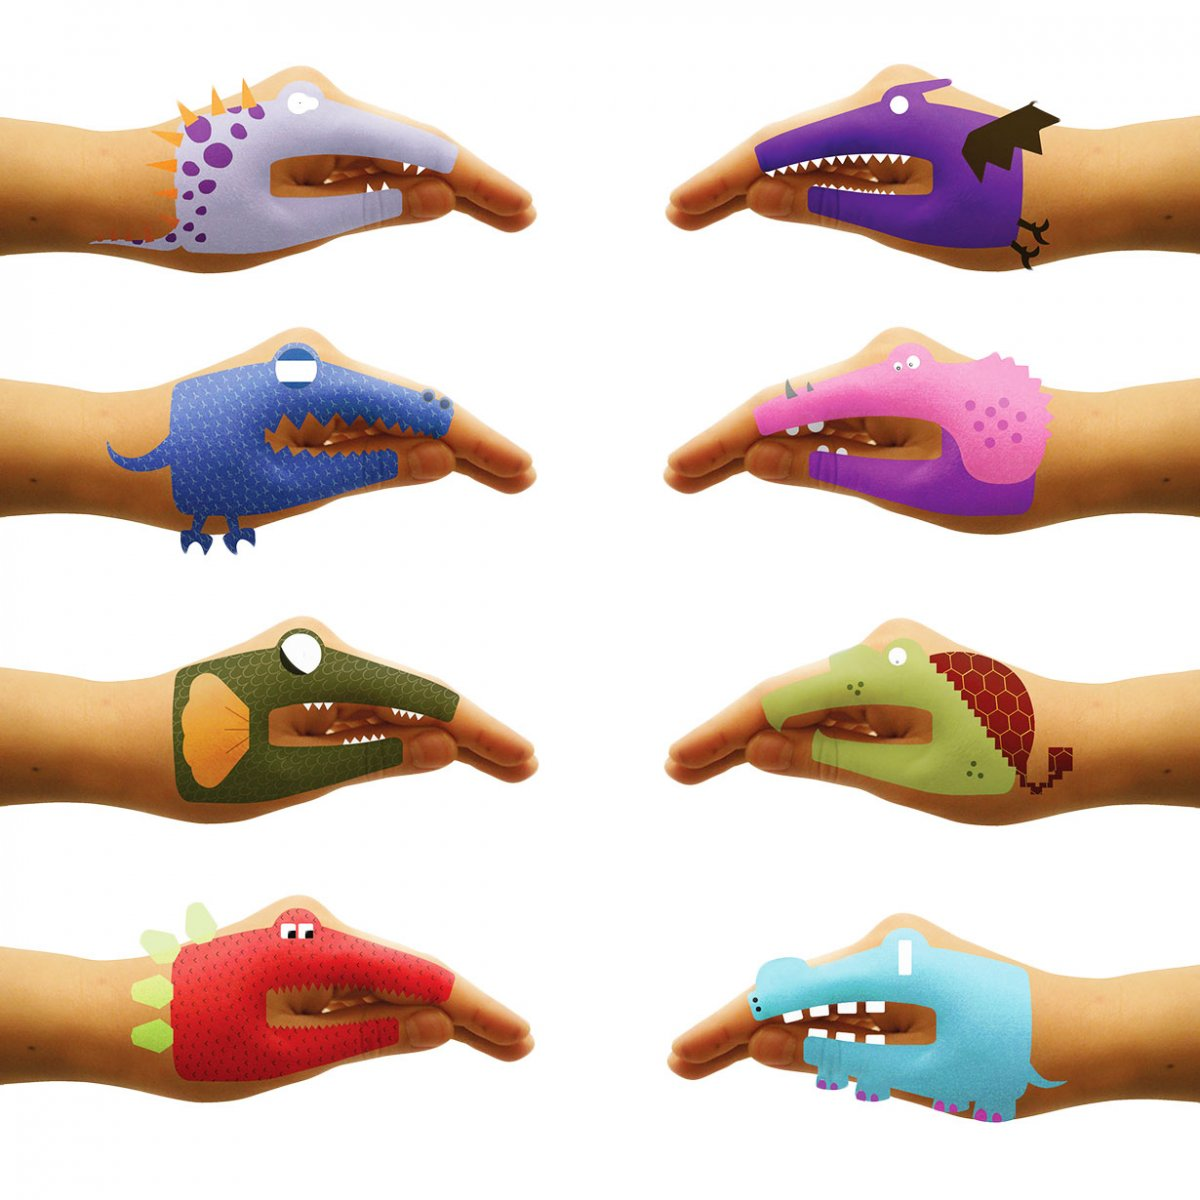 Tatuaggio temporaneo Dino Hands_NPW